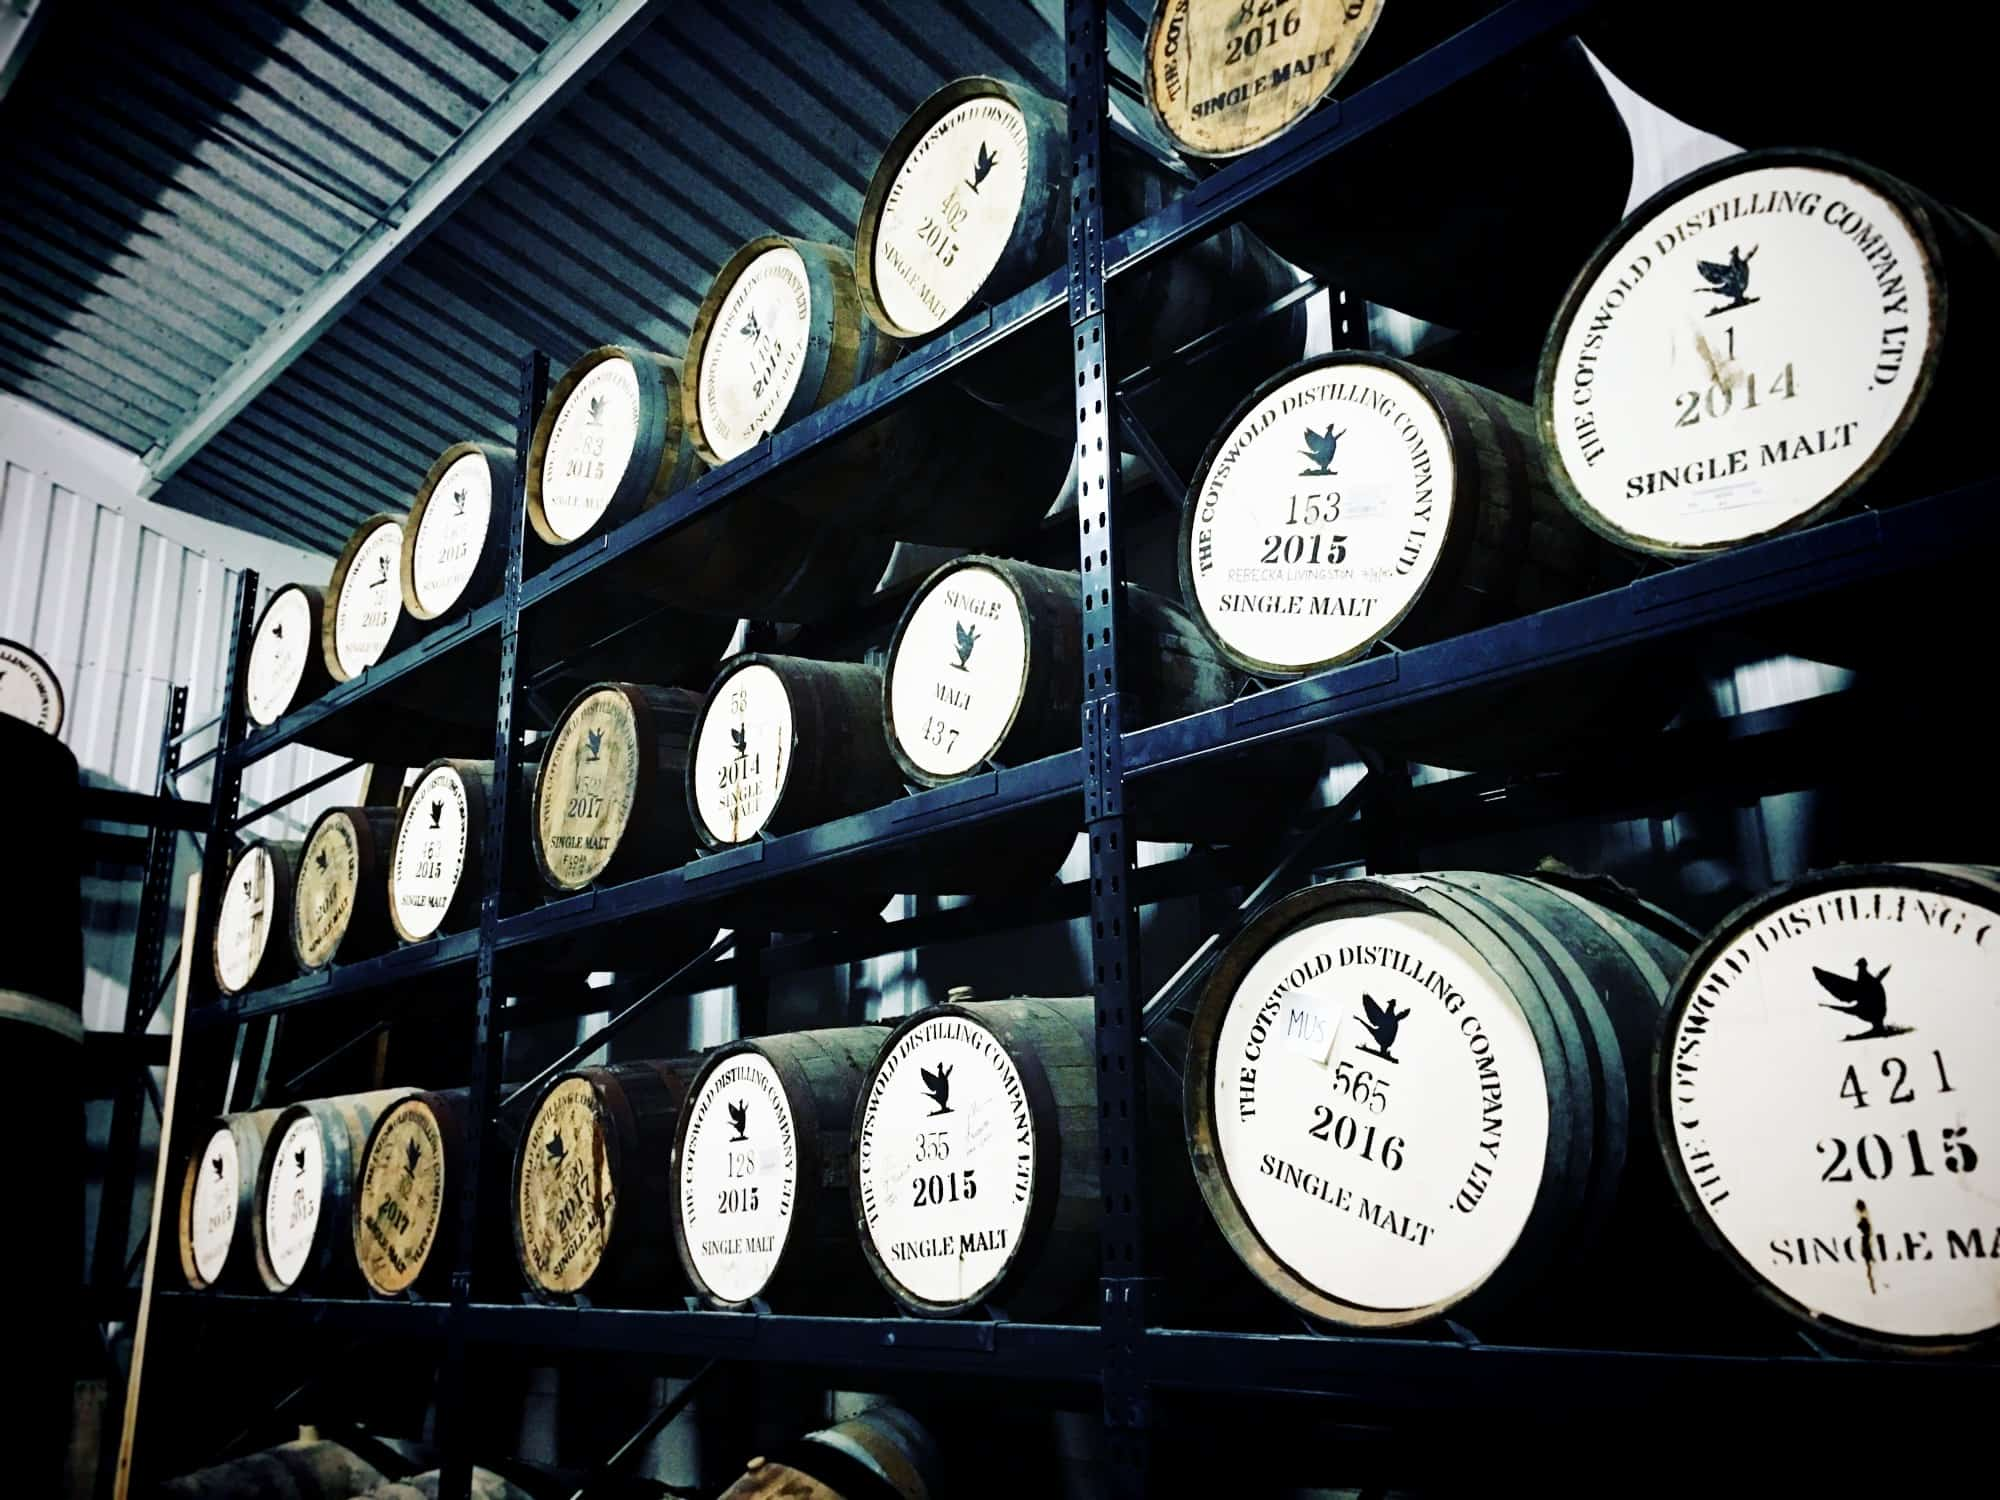 Cotswolds Whisky Casks